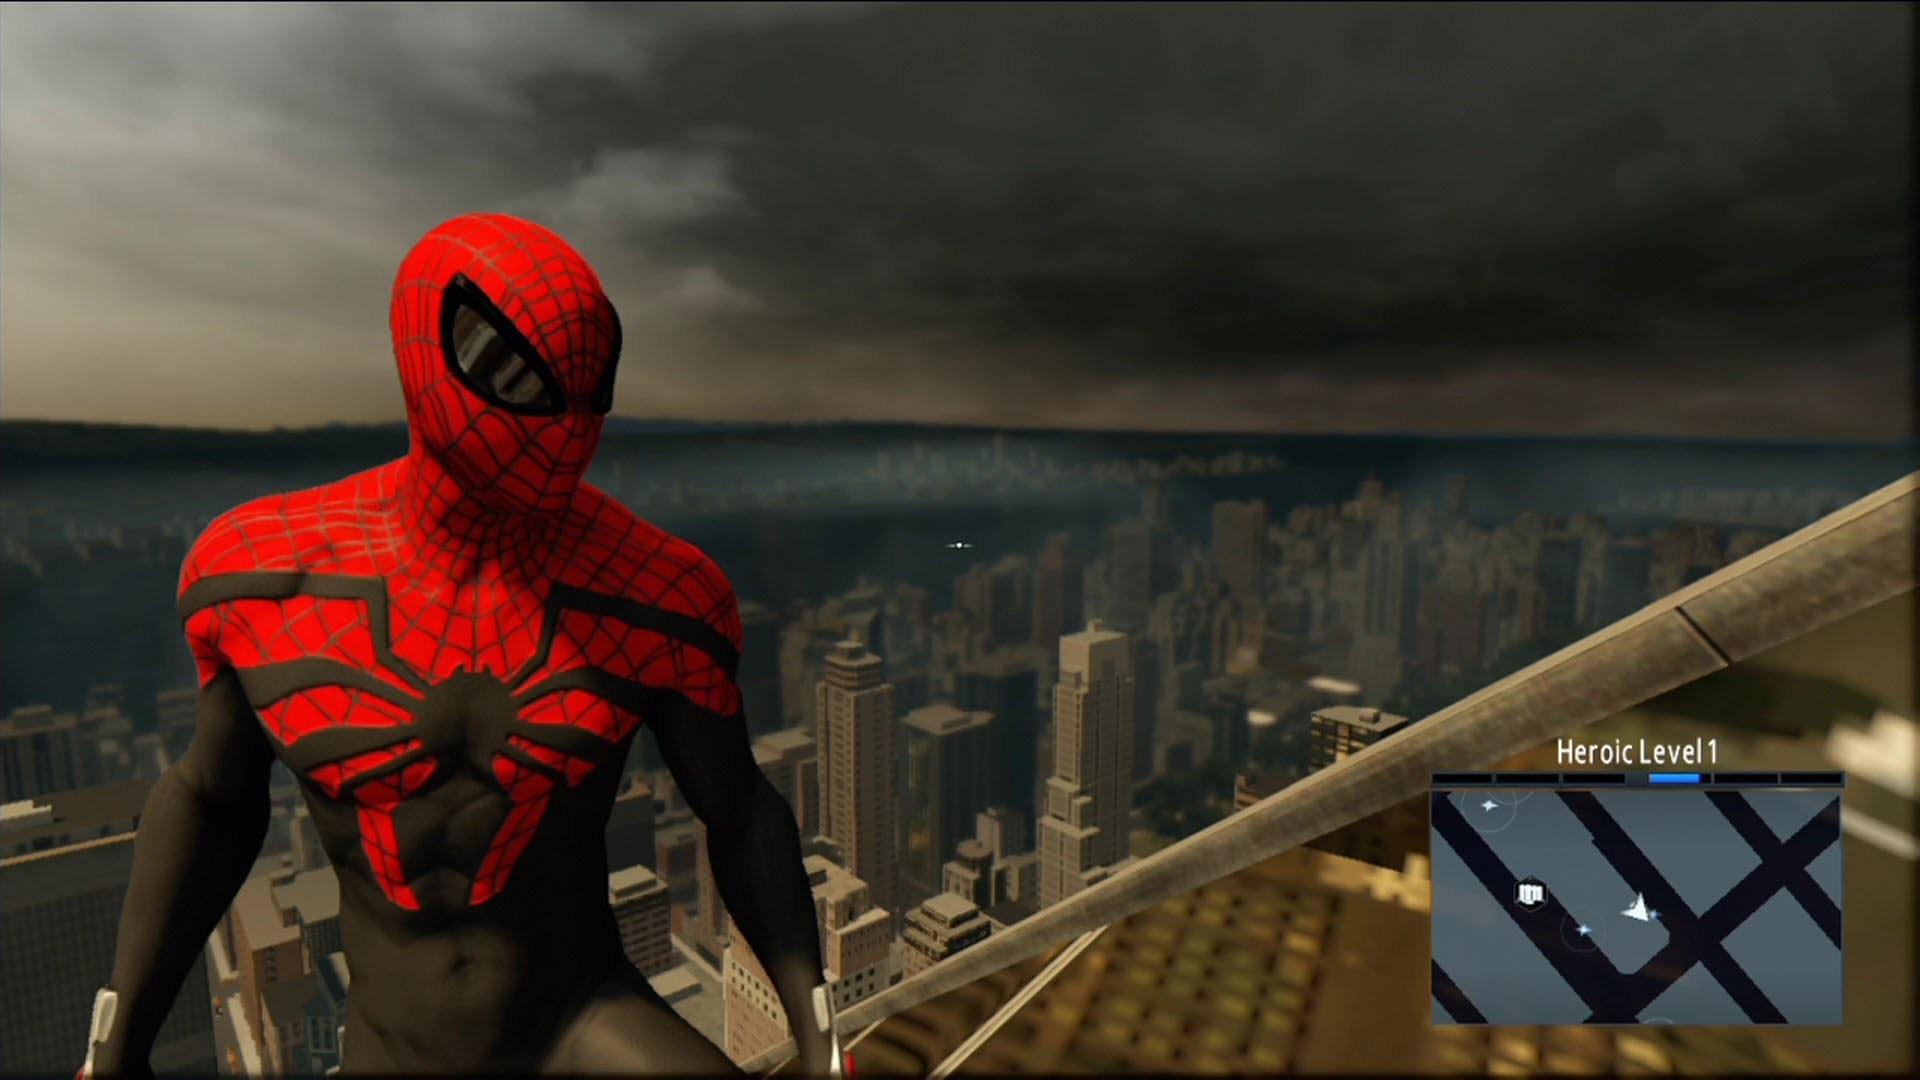 superior spider man iphone wallpaper ·①